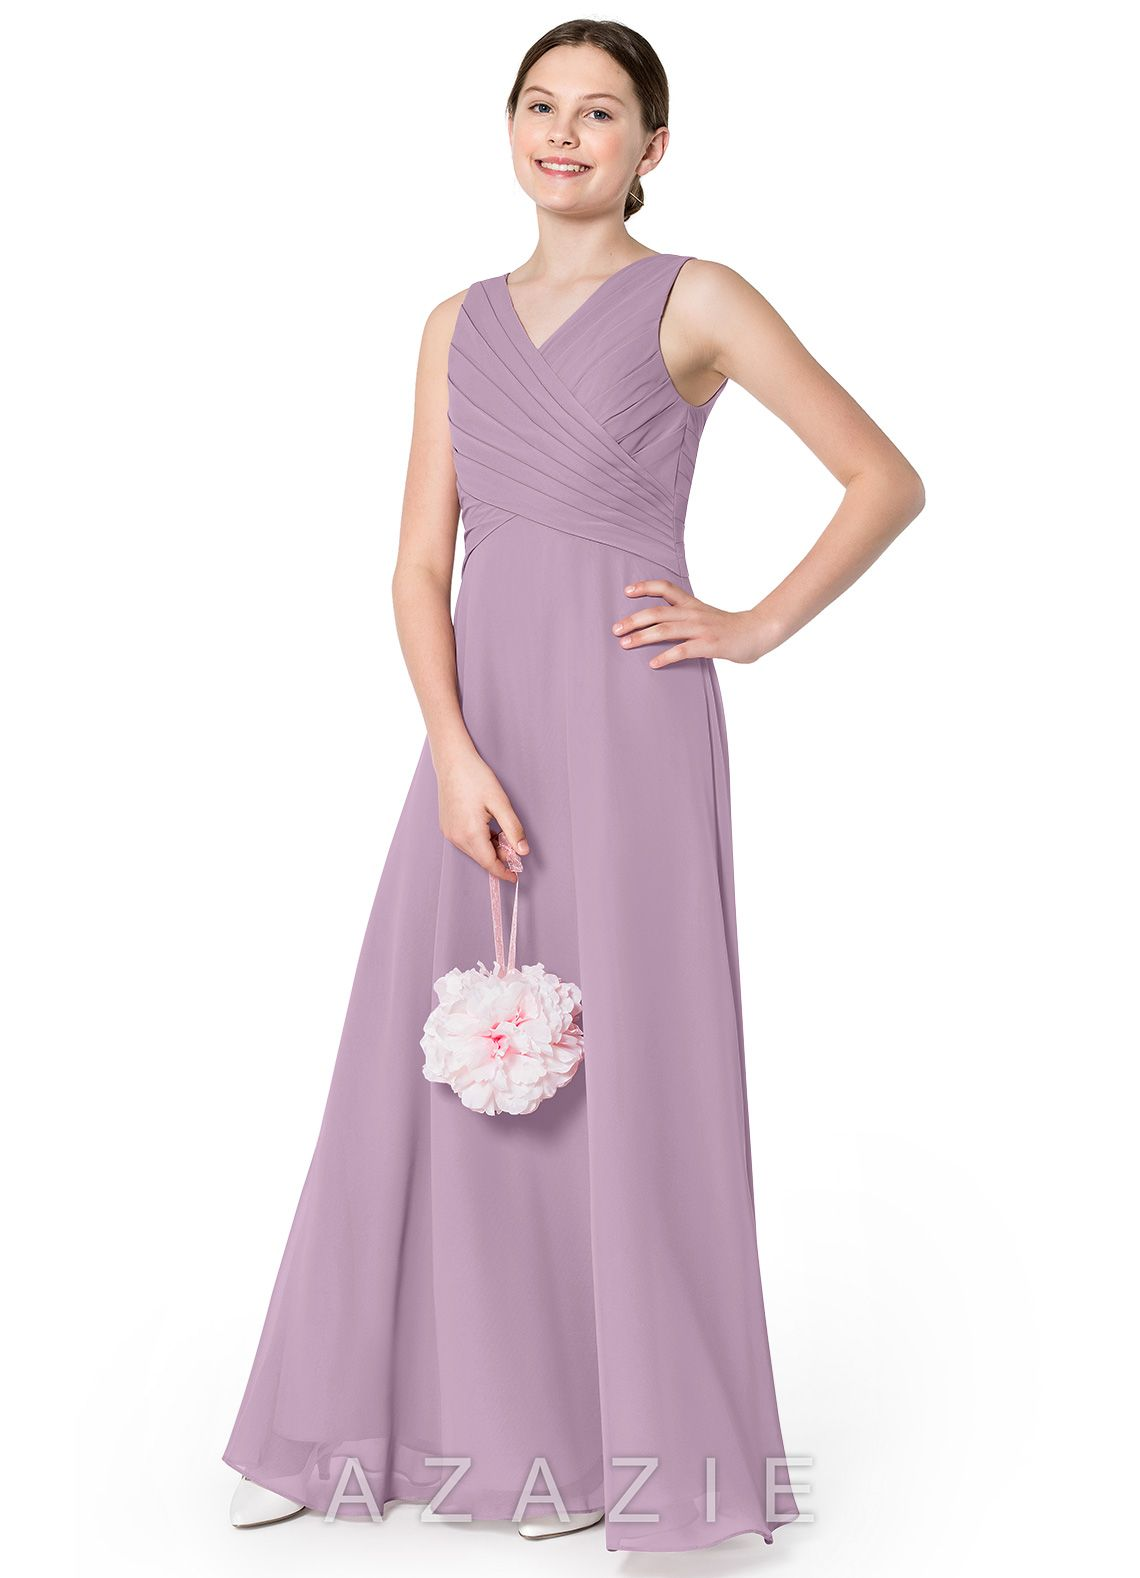 c6591a6a349 Azazie Flora JBD Junior Bridesmaid Dress